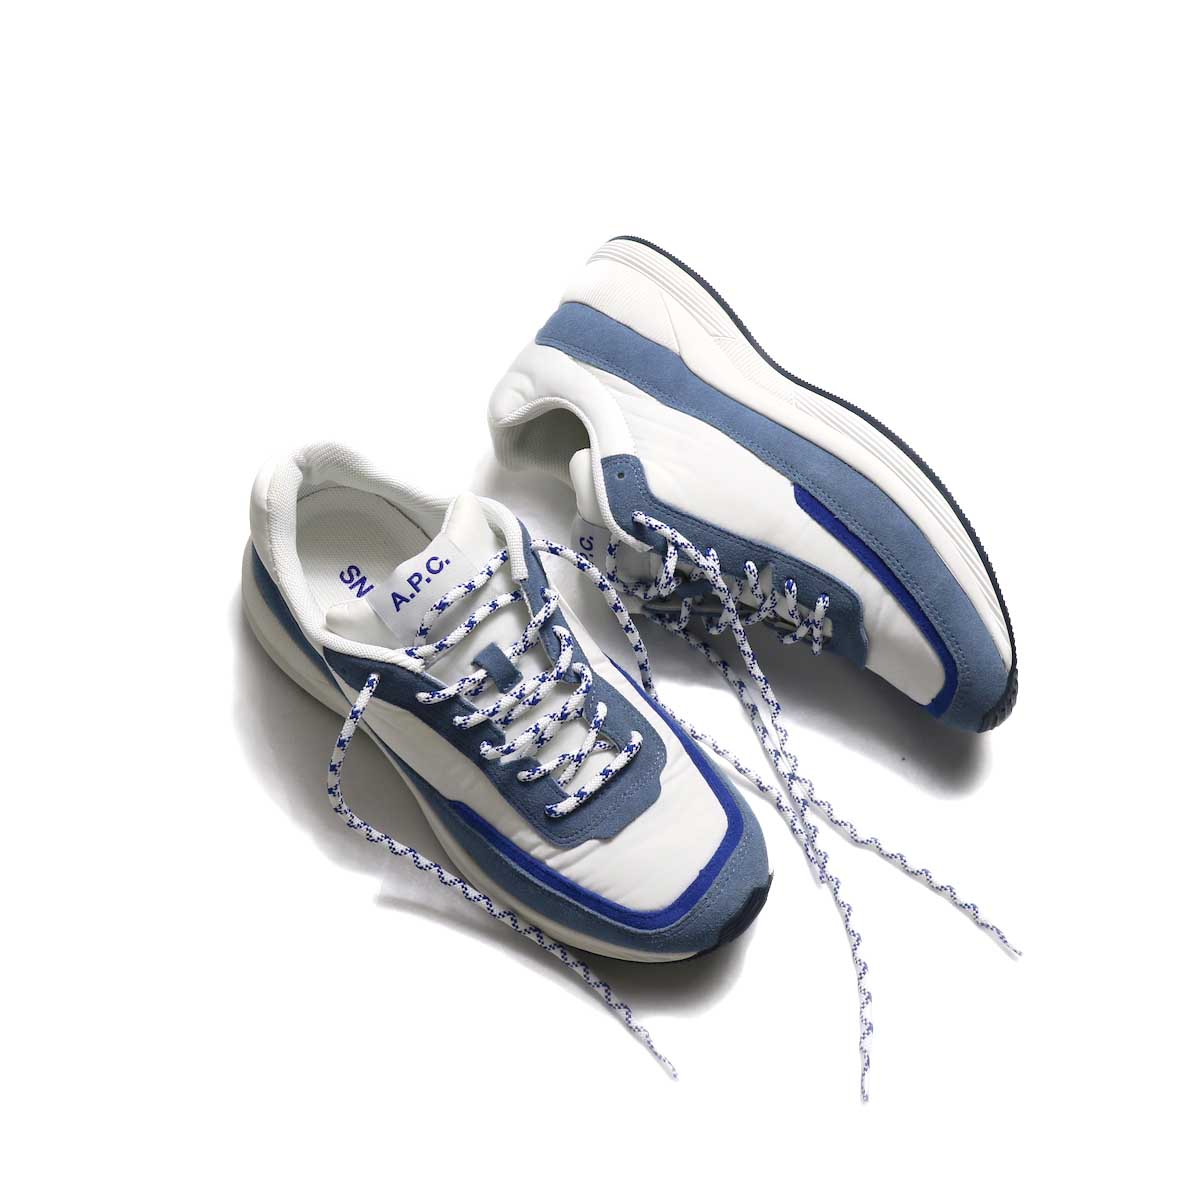 A.P.C. / Teenage Mary -Blue Grey